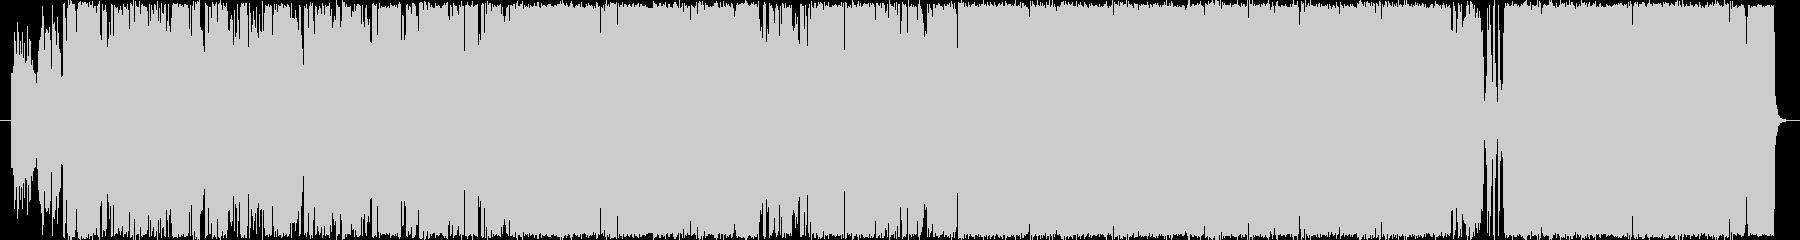 TUBEのような感動的結婚式ソングの未再生の波形